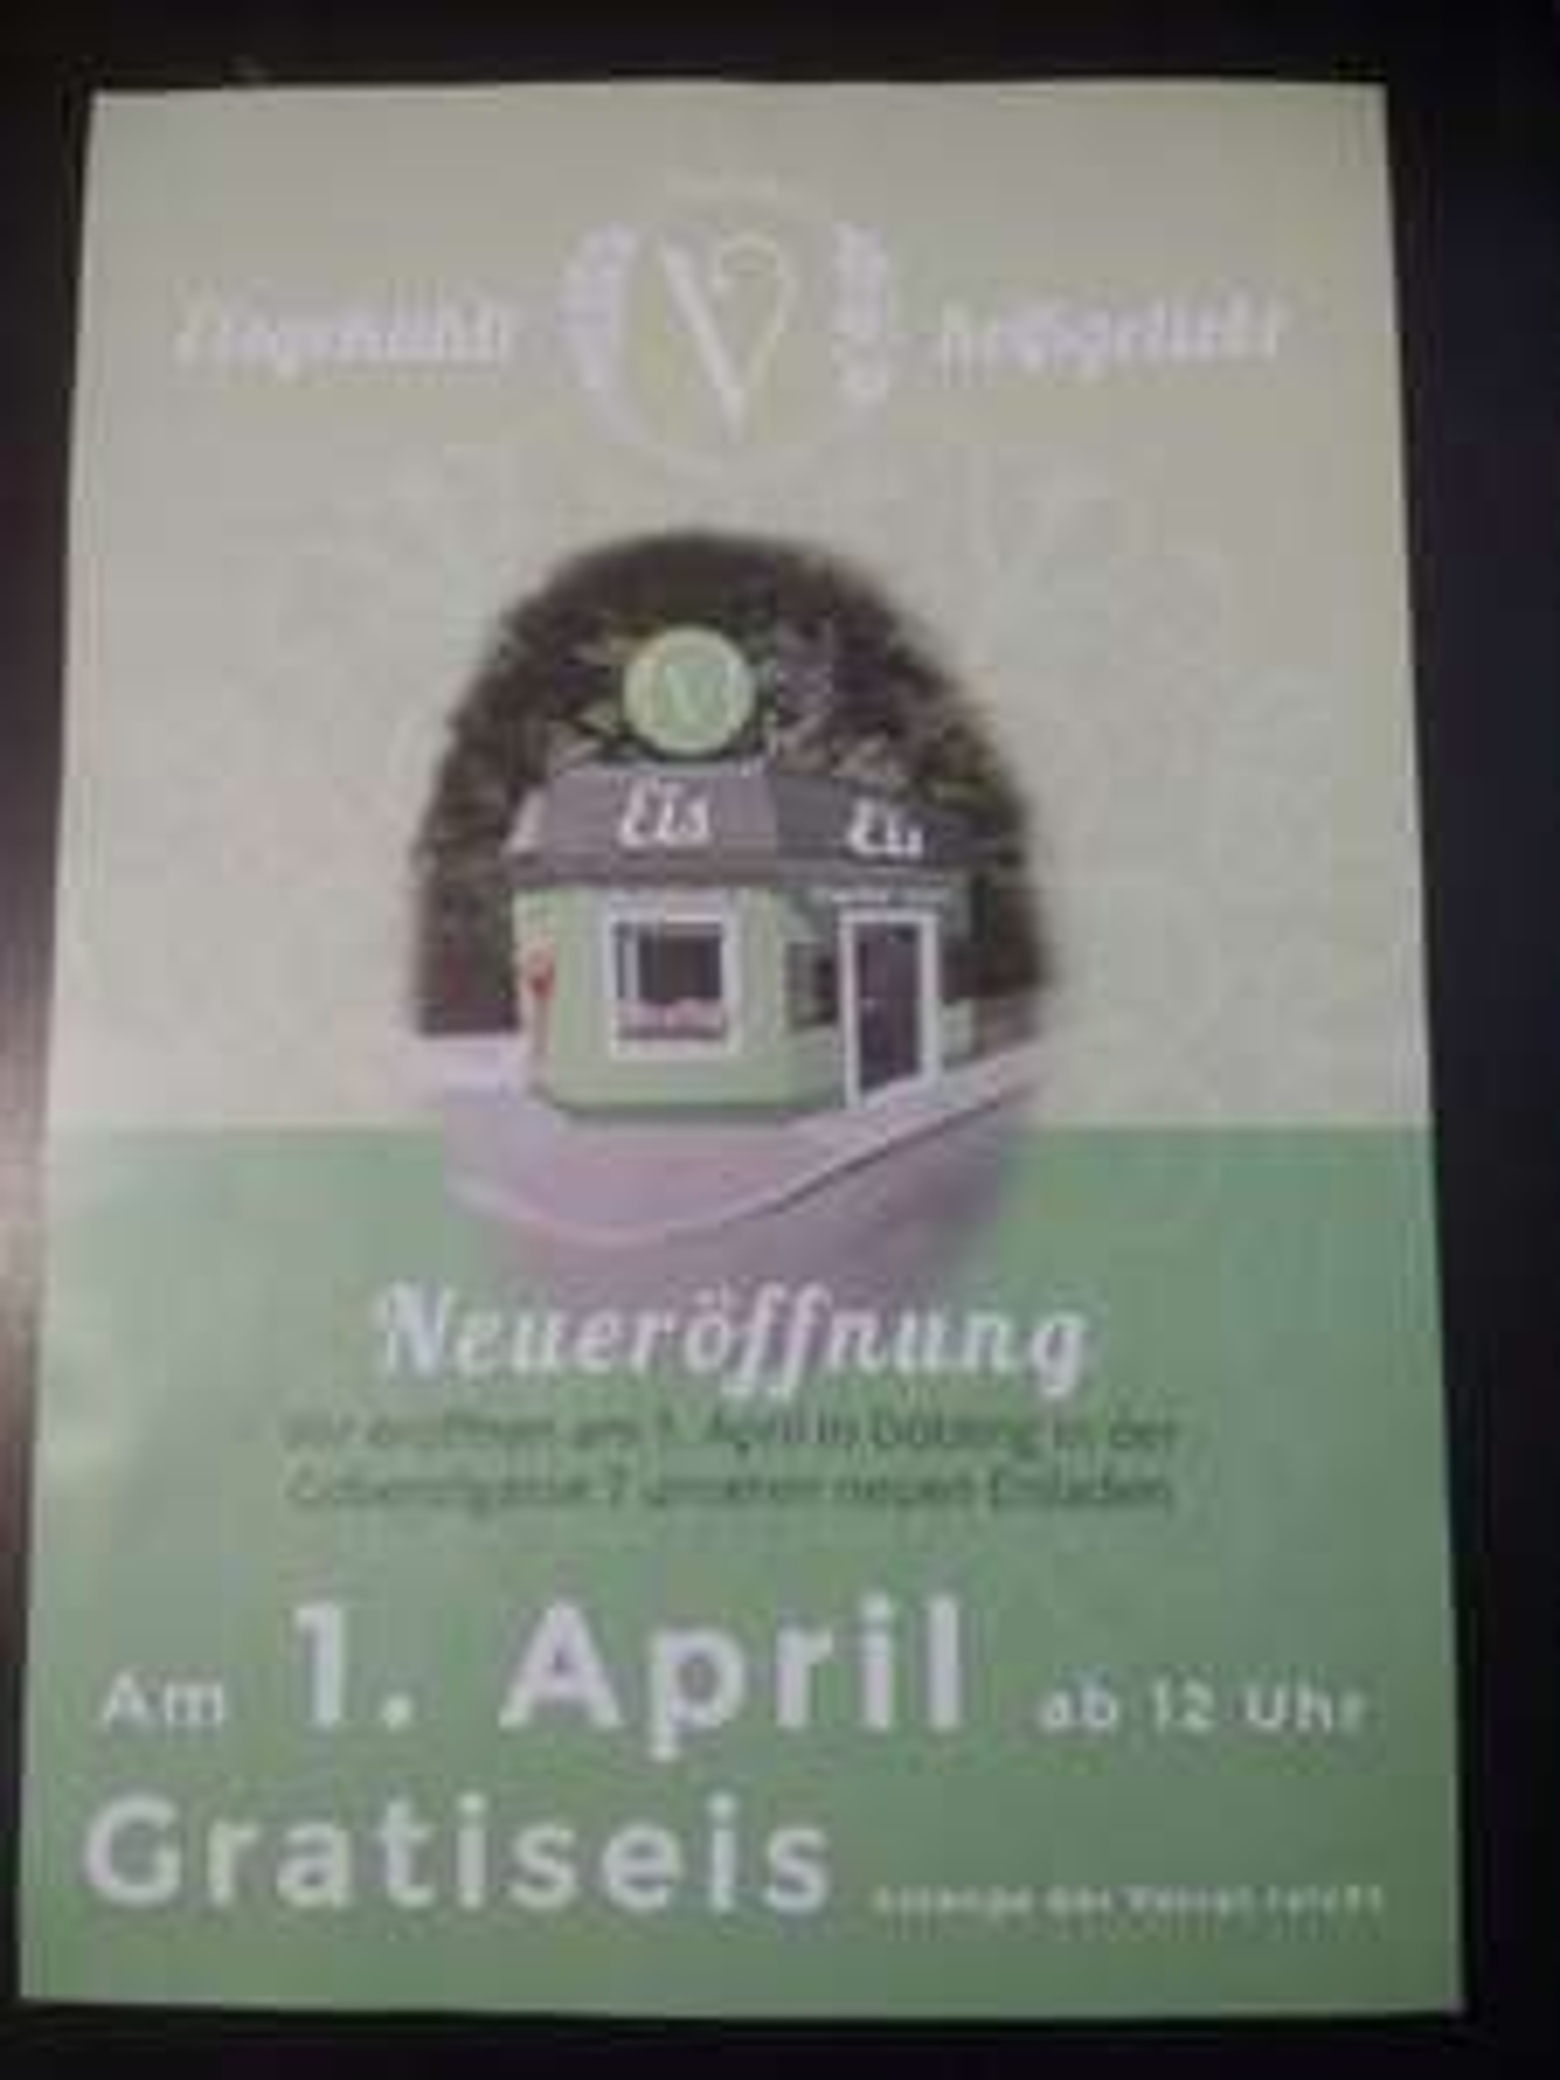 Vidoni 1190 Wien - gratis Eis